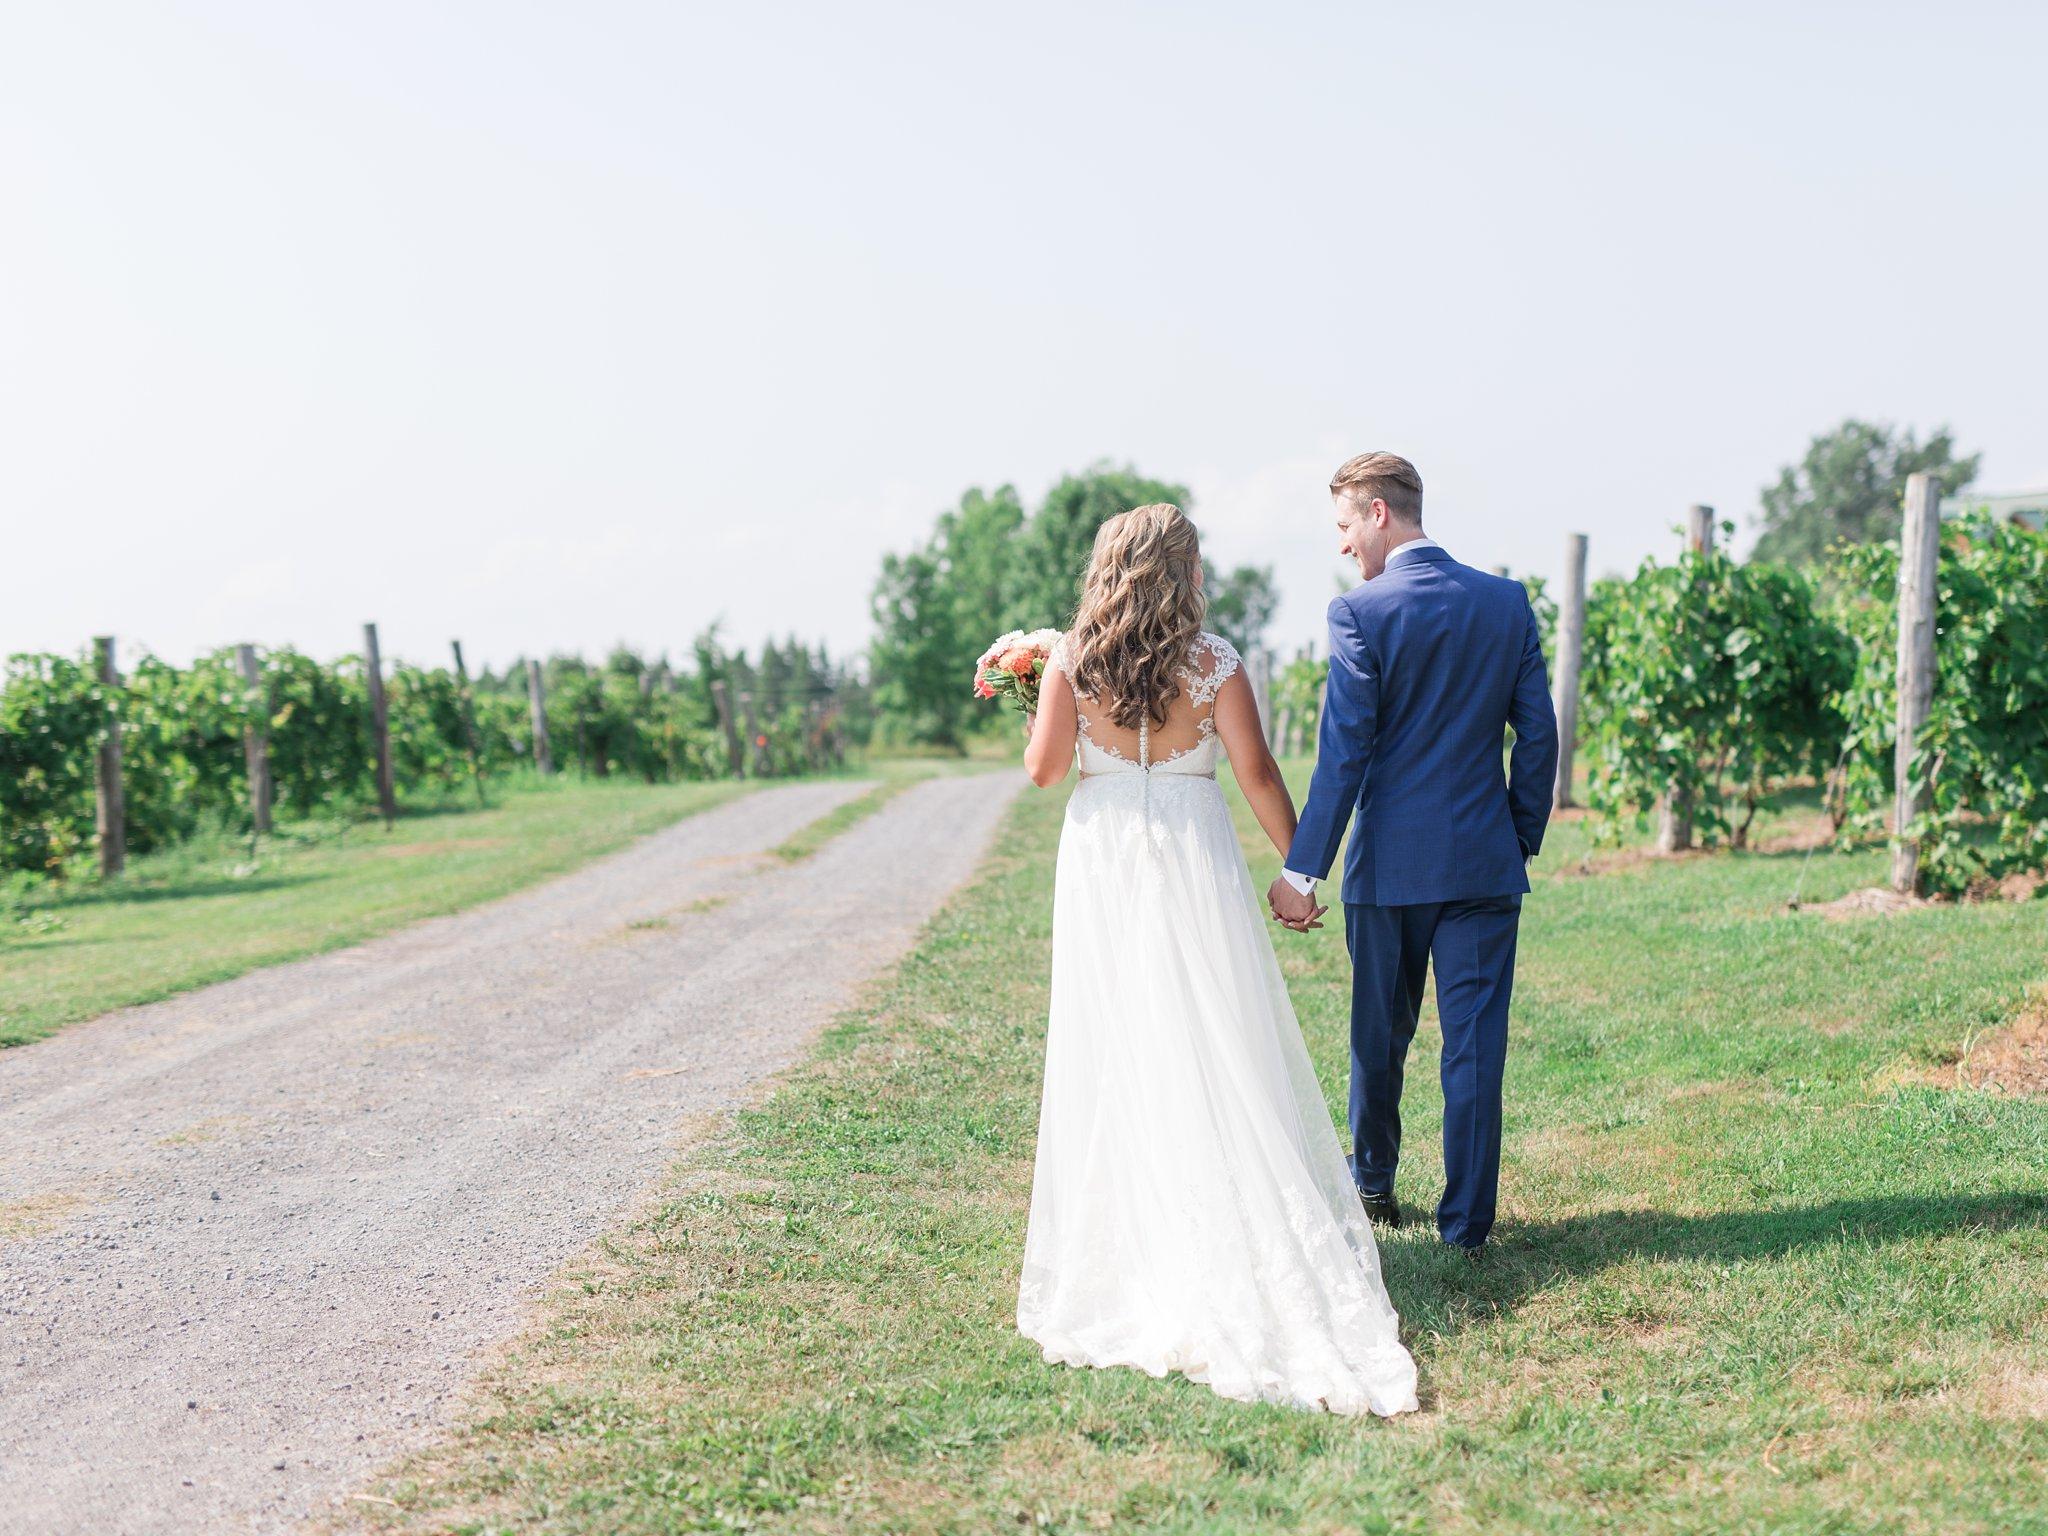 Touring Vineyard wedding at Jabulani Amy Pinder Photography